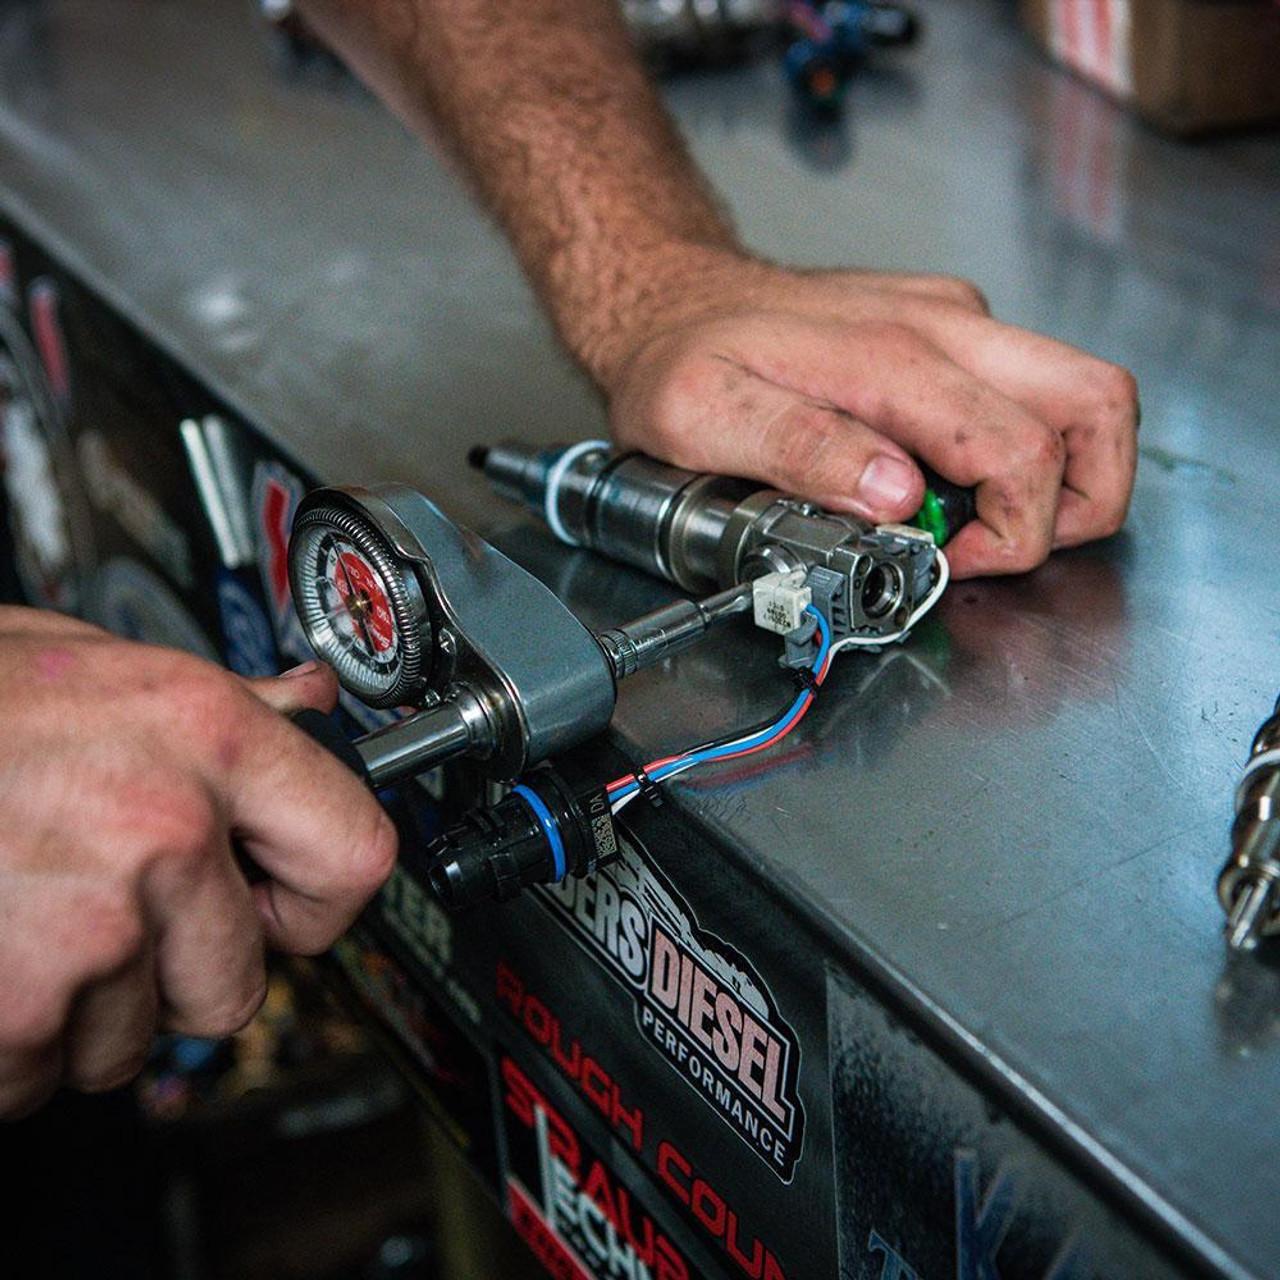 Holders Premium Injector Set Stage 1 155CC